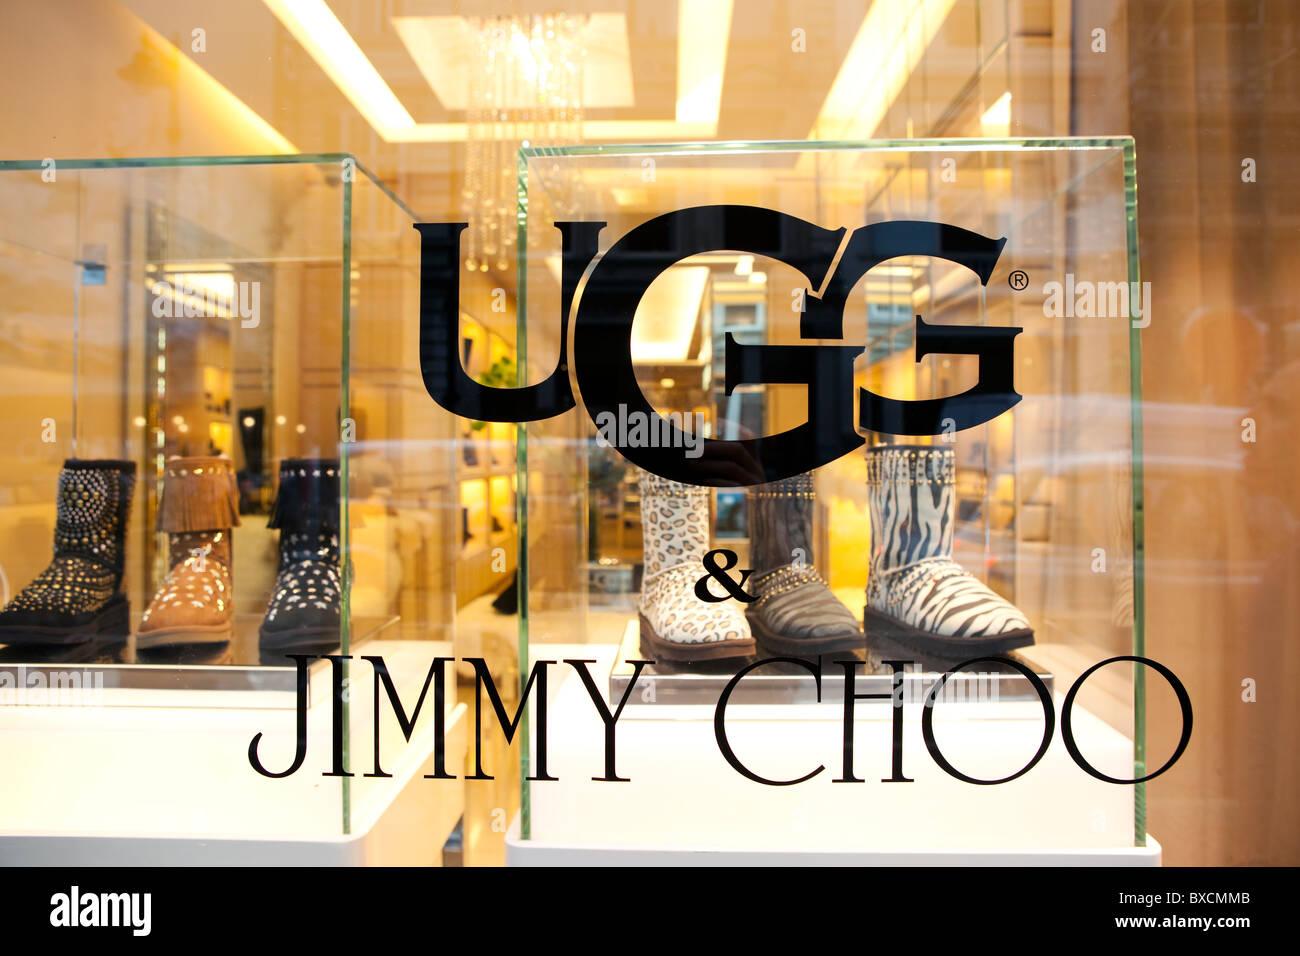 a9028637f3b Jimmy Choo store in New Bond street. London Stock Photo: 33471099 ...